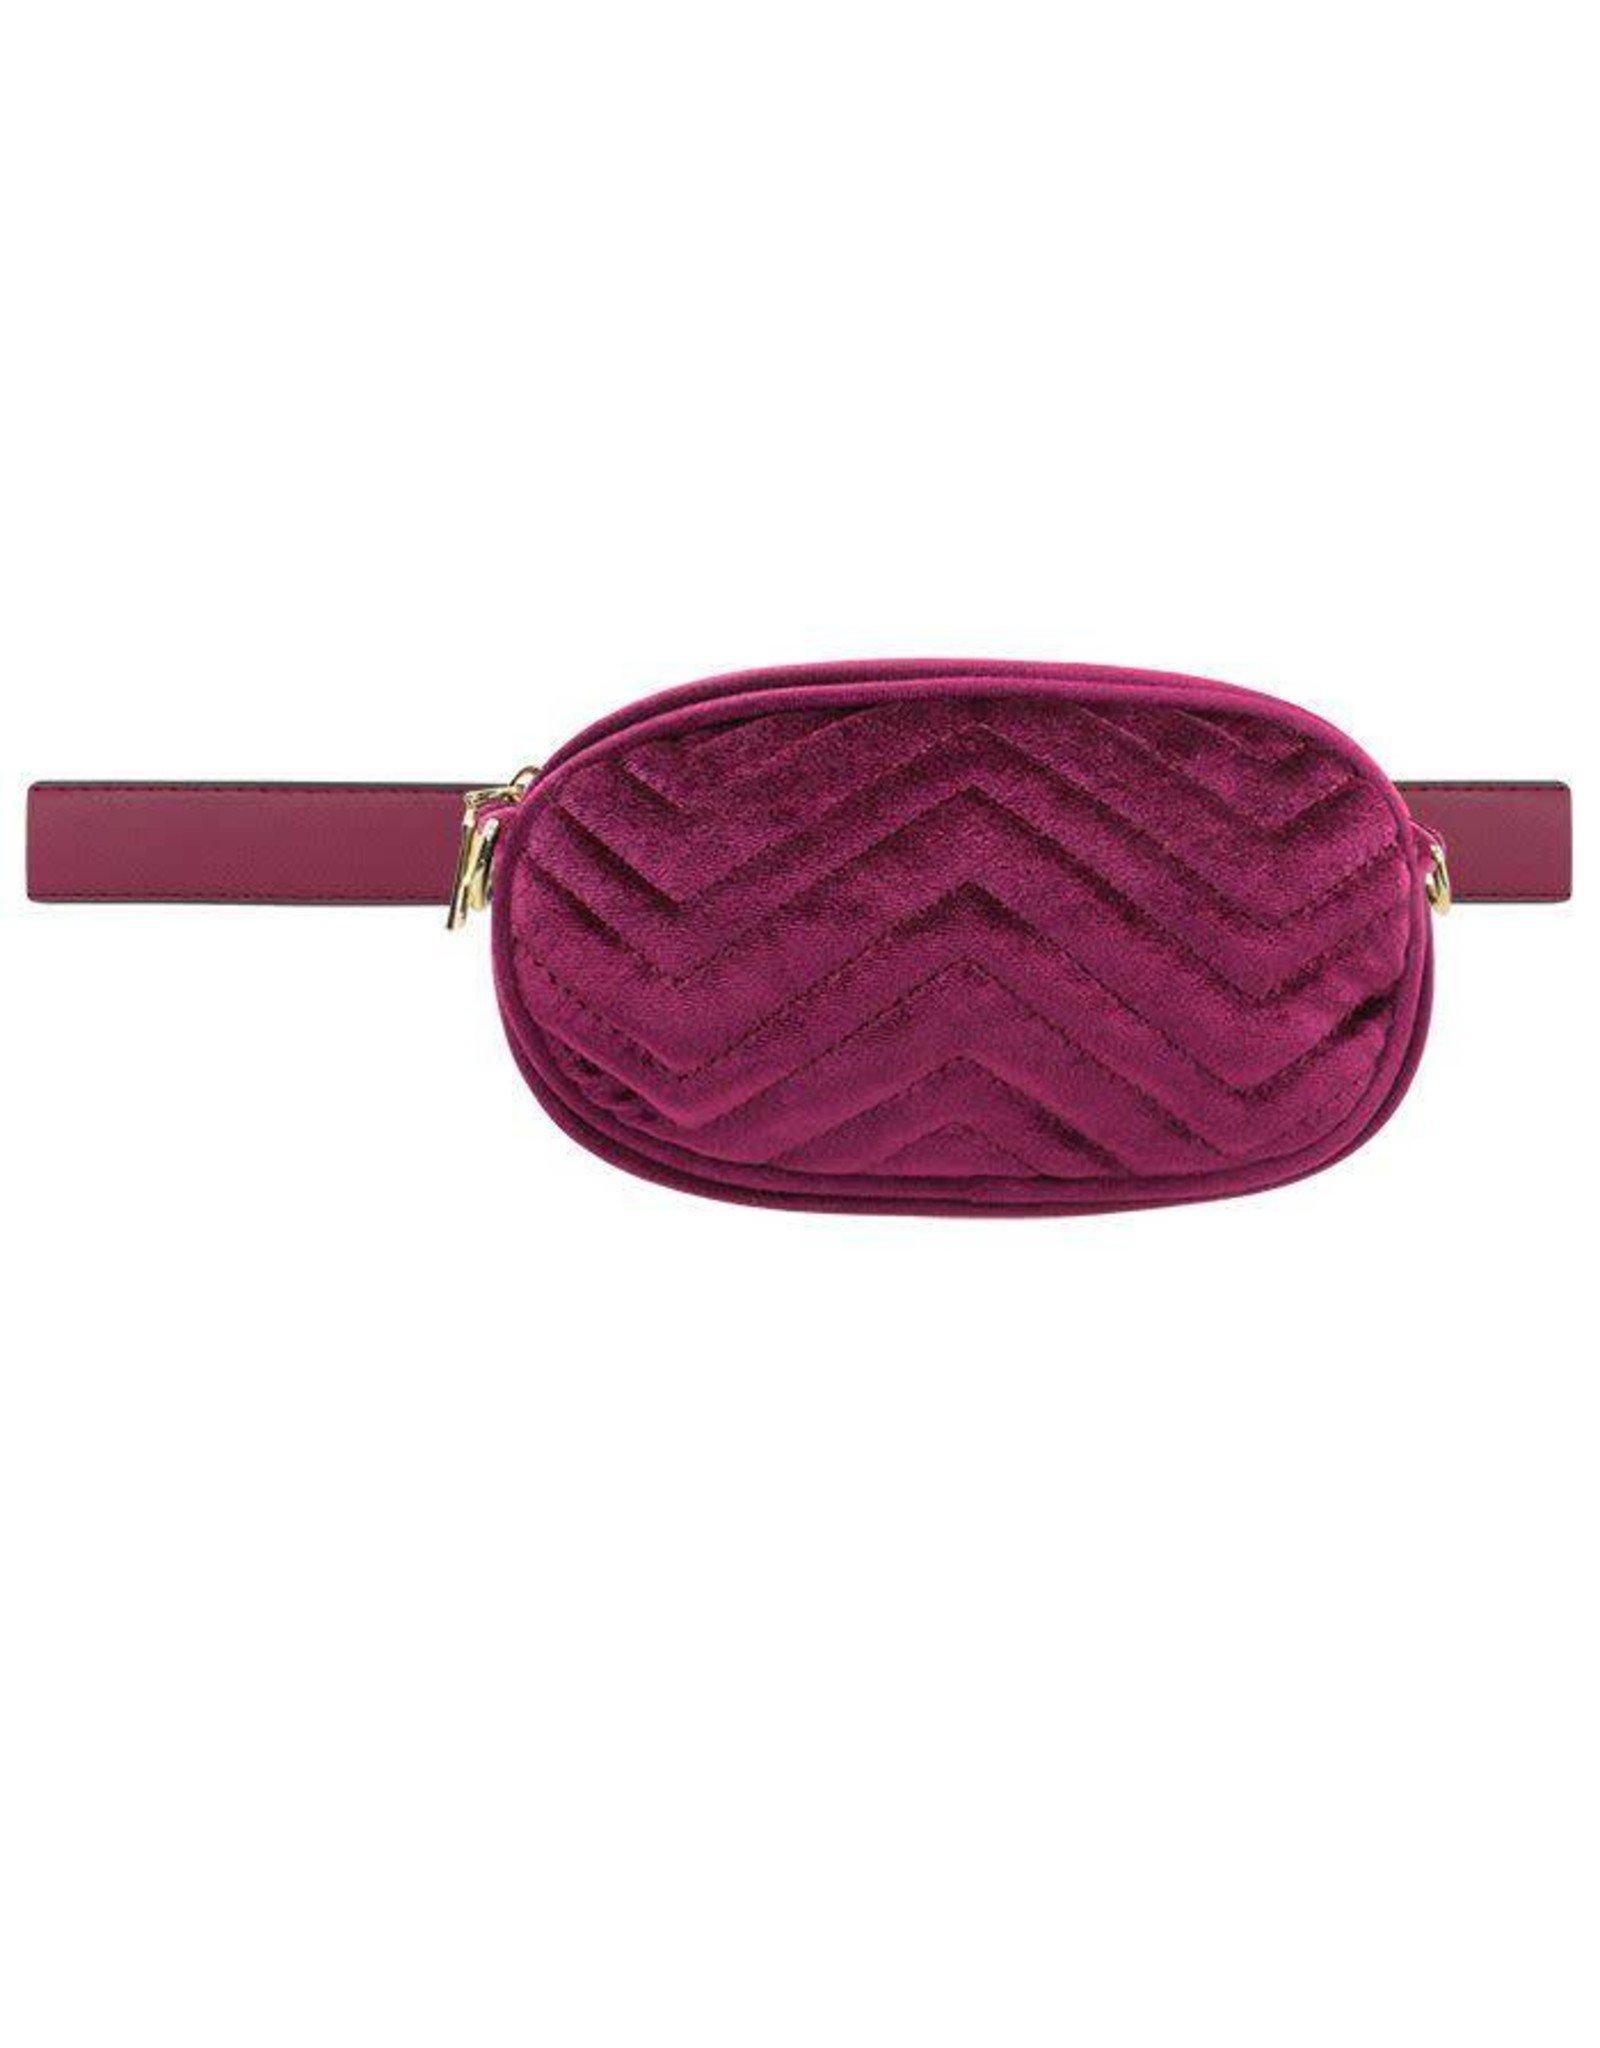 My Jewelry The Purple Bumbag